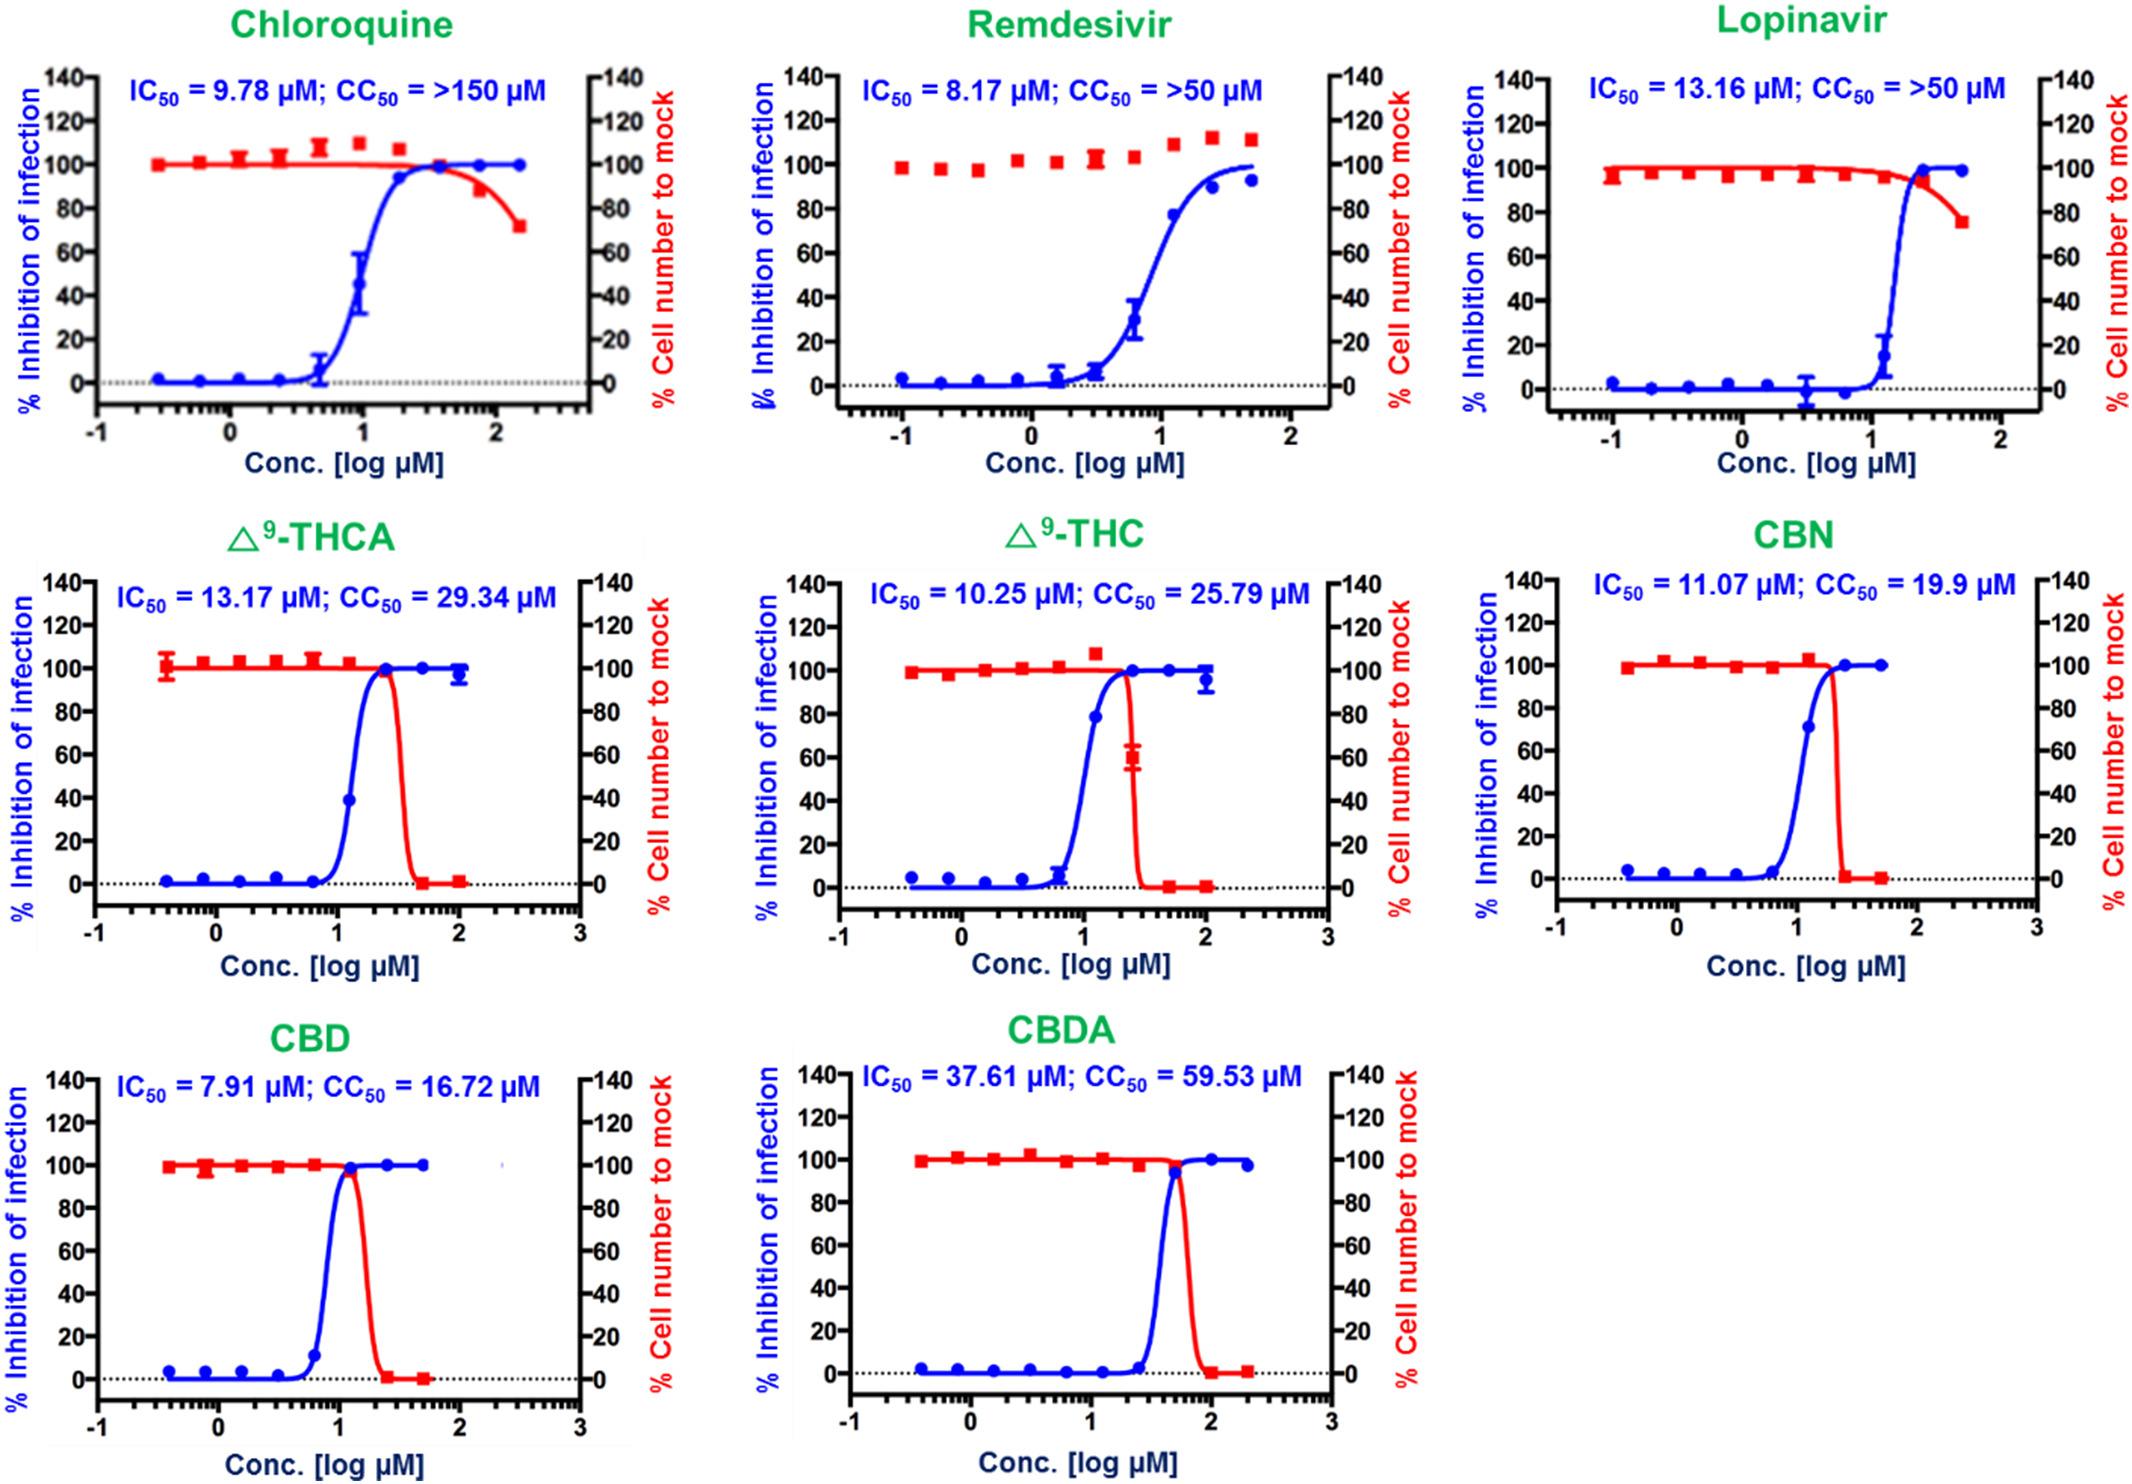 Analisi curva dose-risposta lopinavir chloroqine remdesivir e cannabinoidi